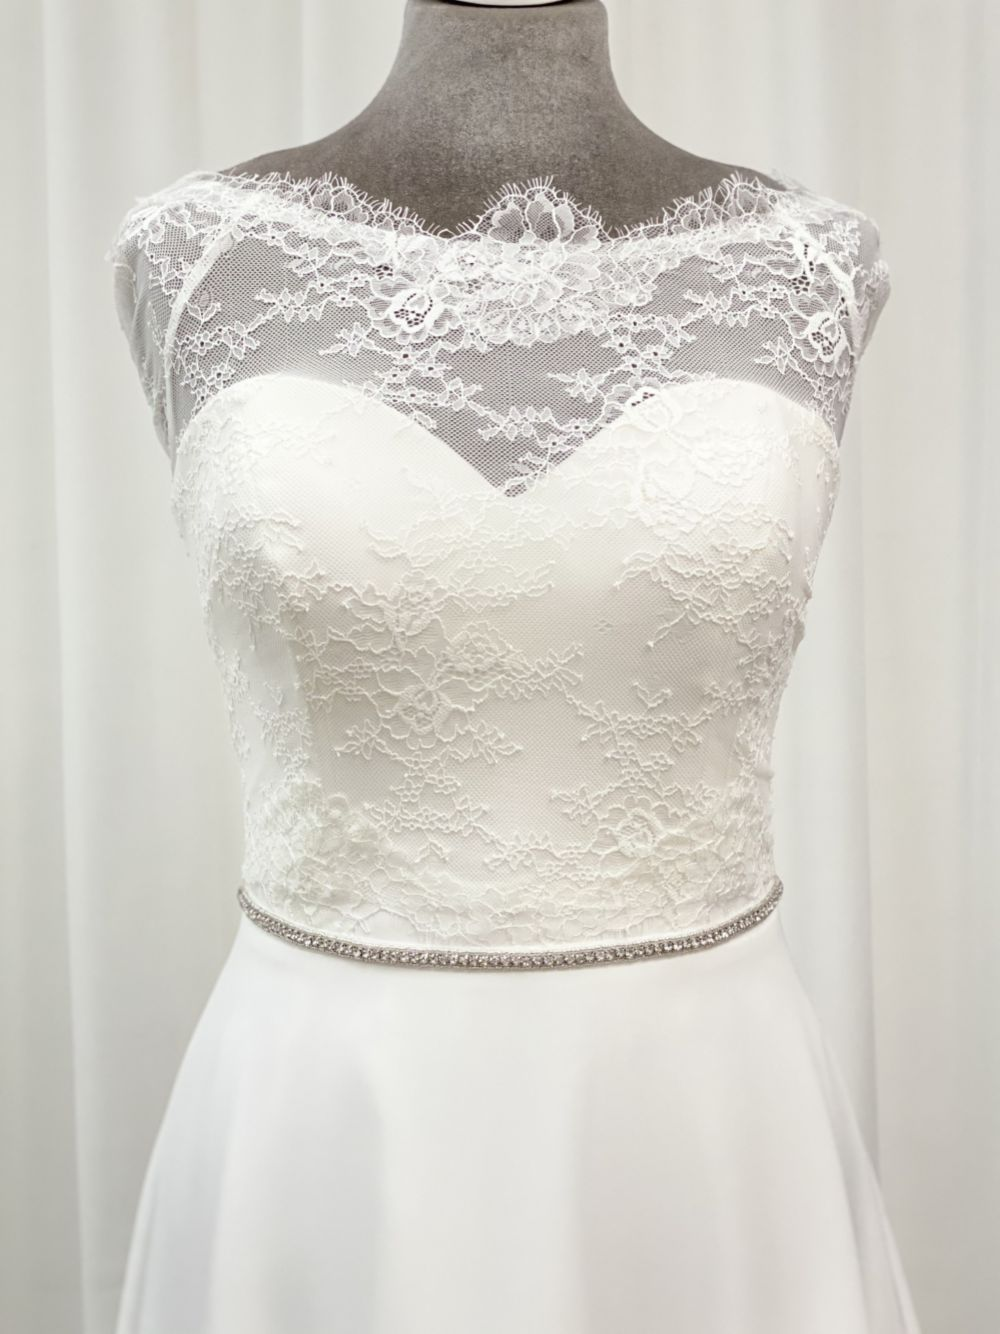 Perfect Bridal Rhiannon Thin Sparkly Diamante Dress Belt